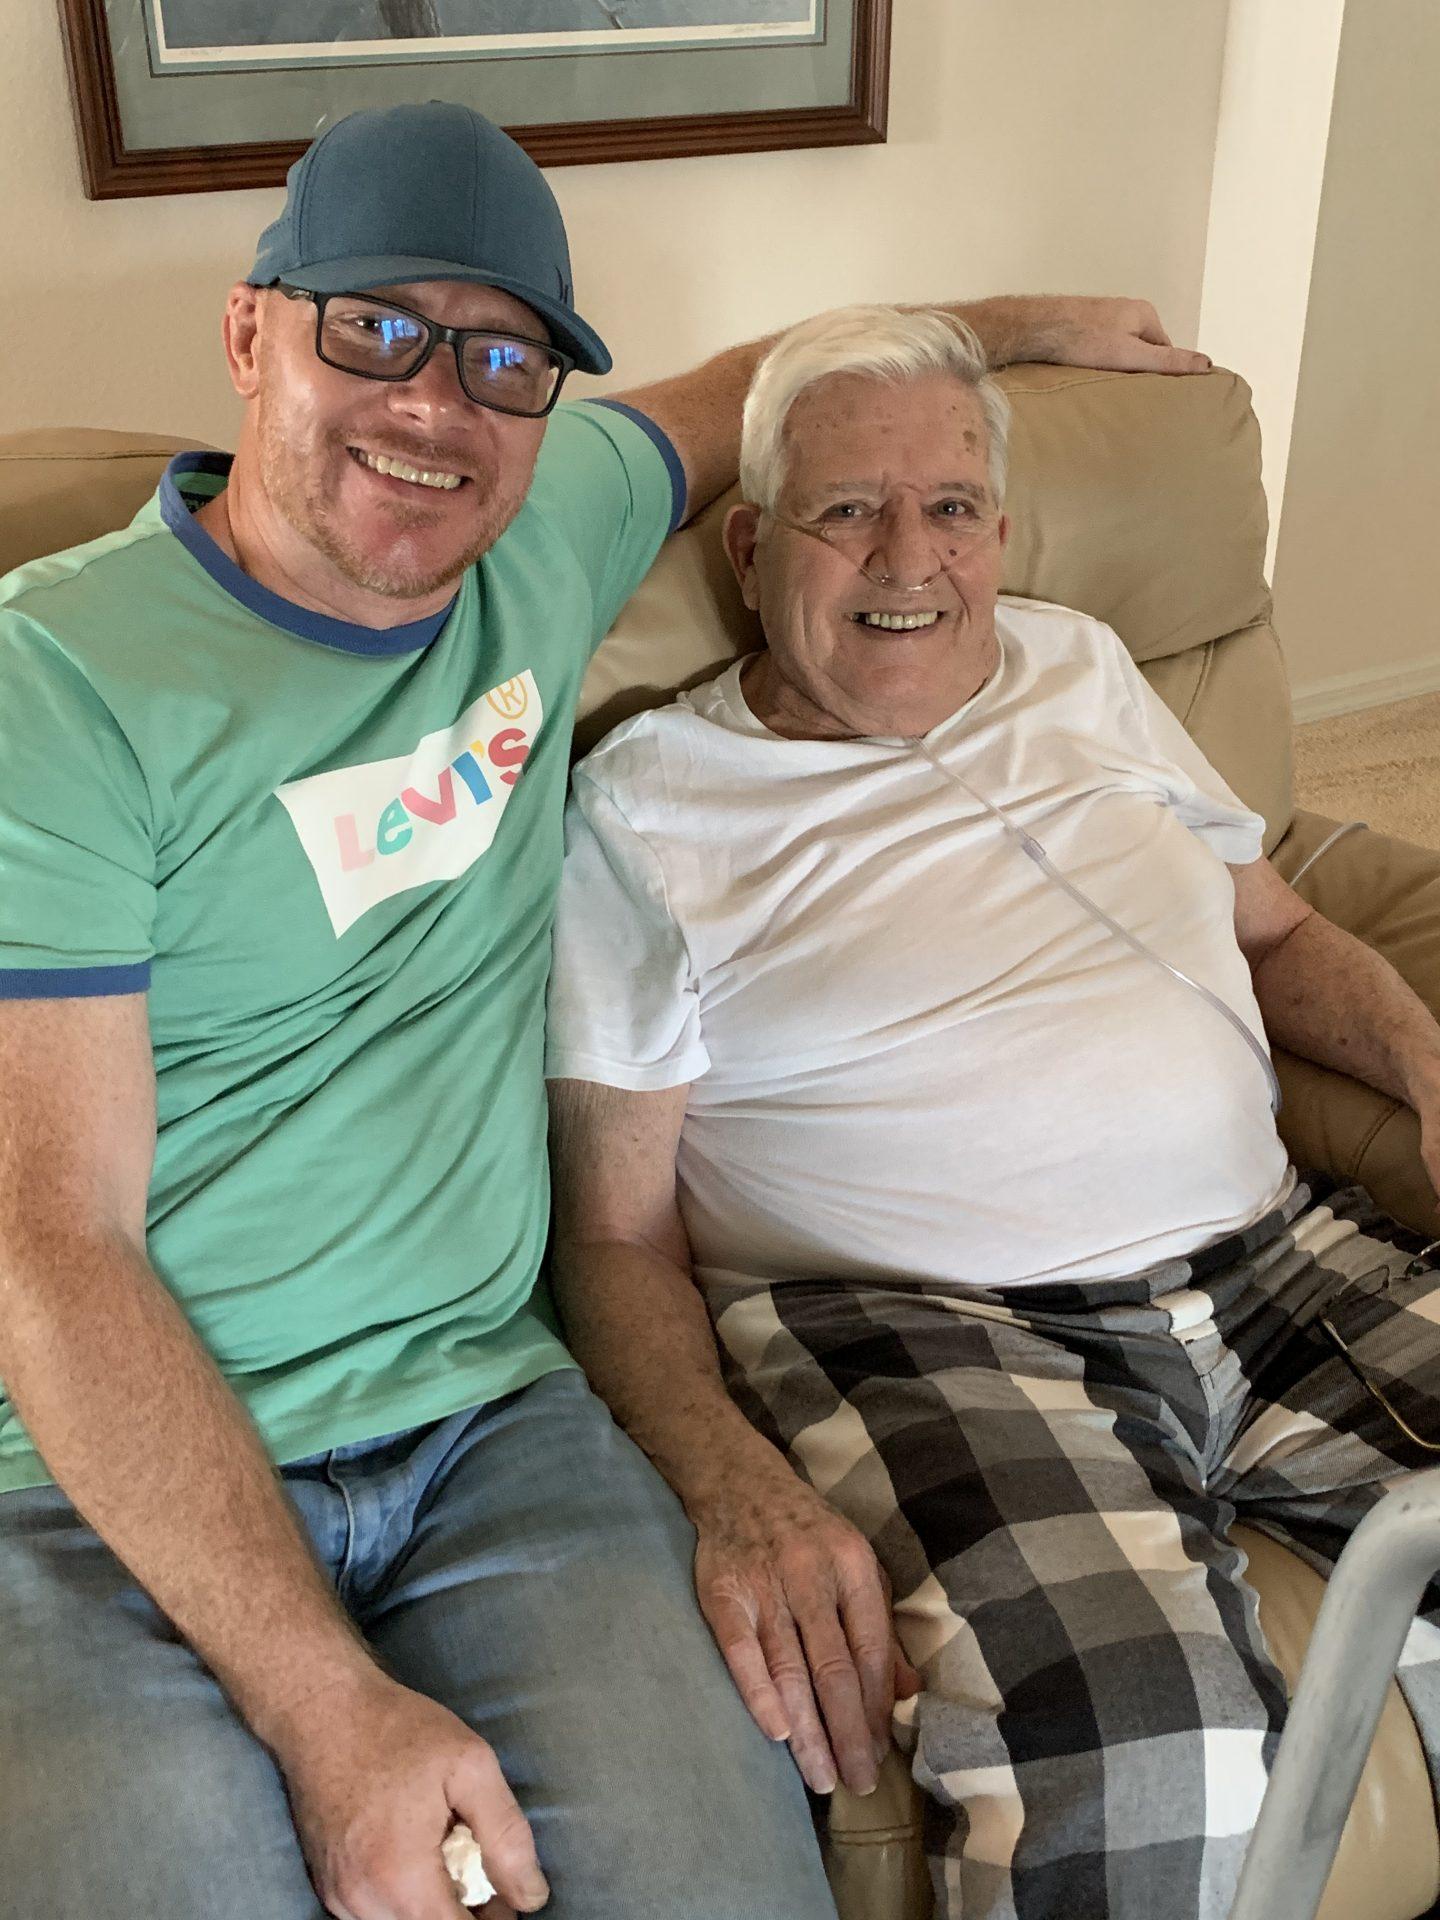 Grandpa and Jeremy